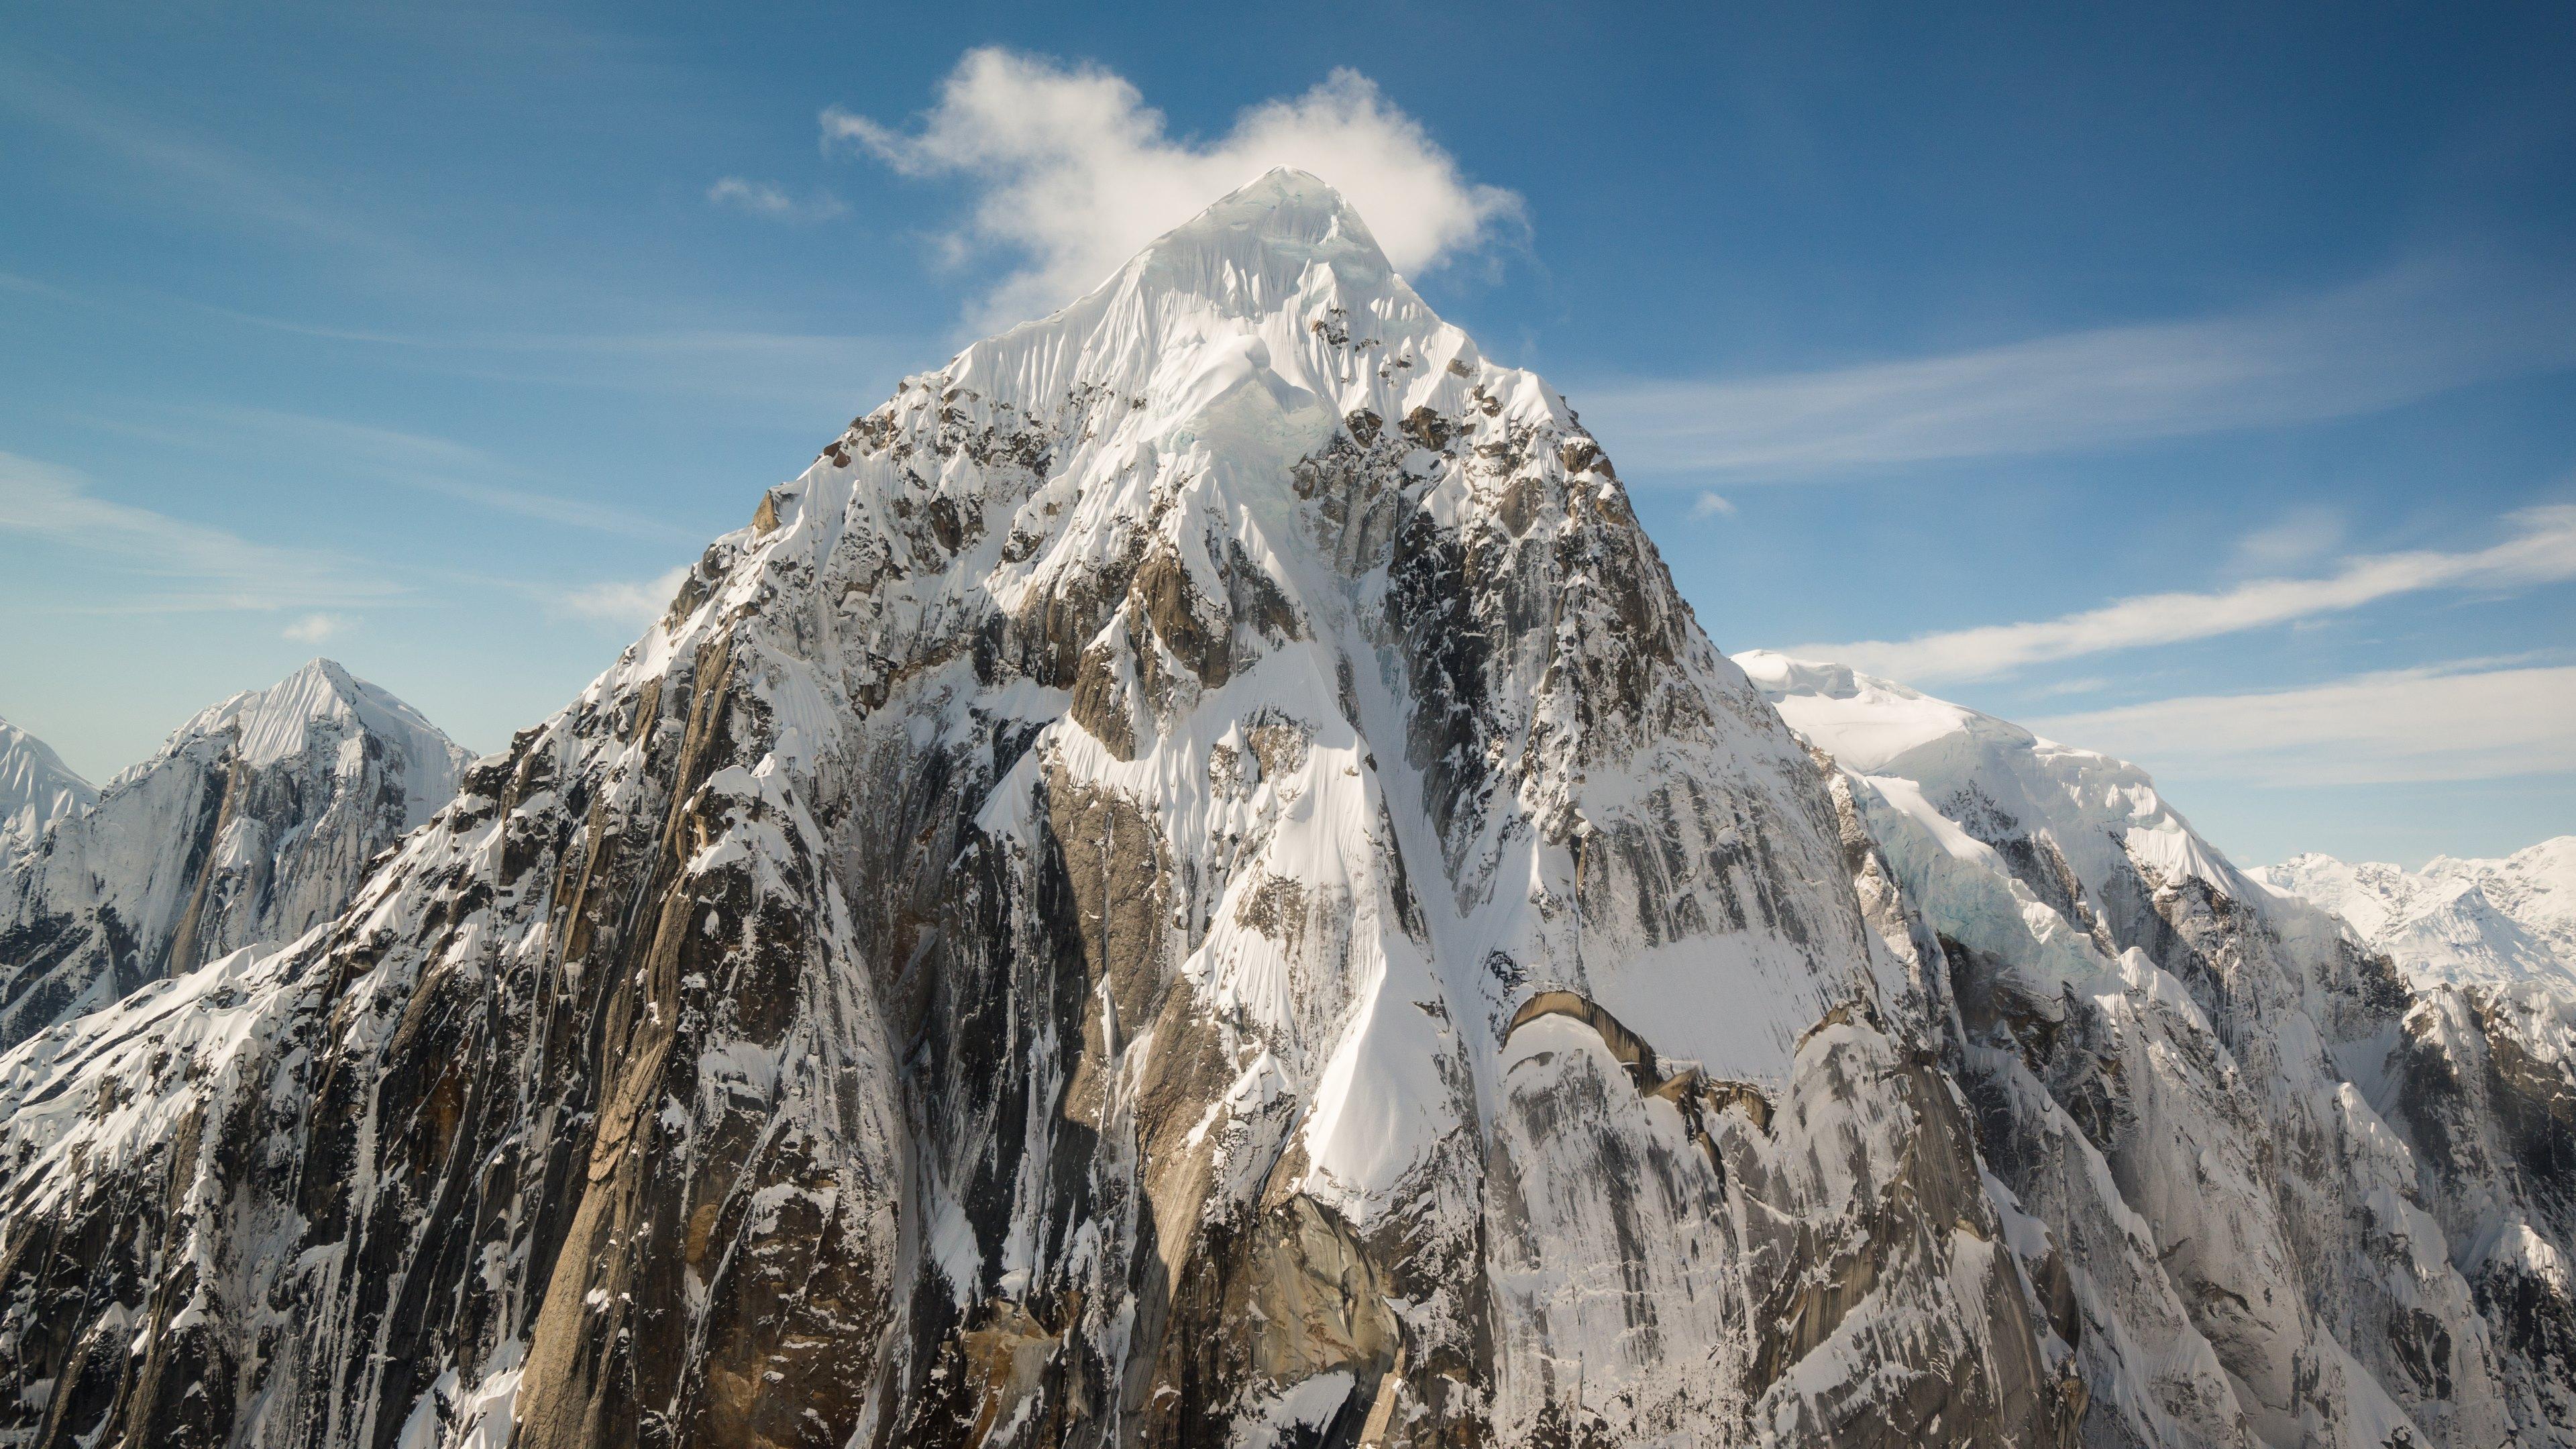 4k mountain wallpaper - photo #5